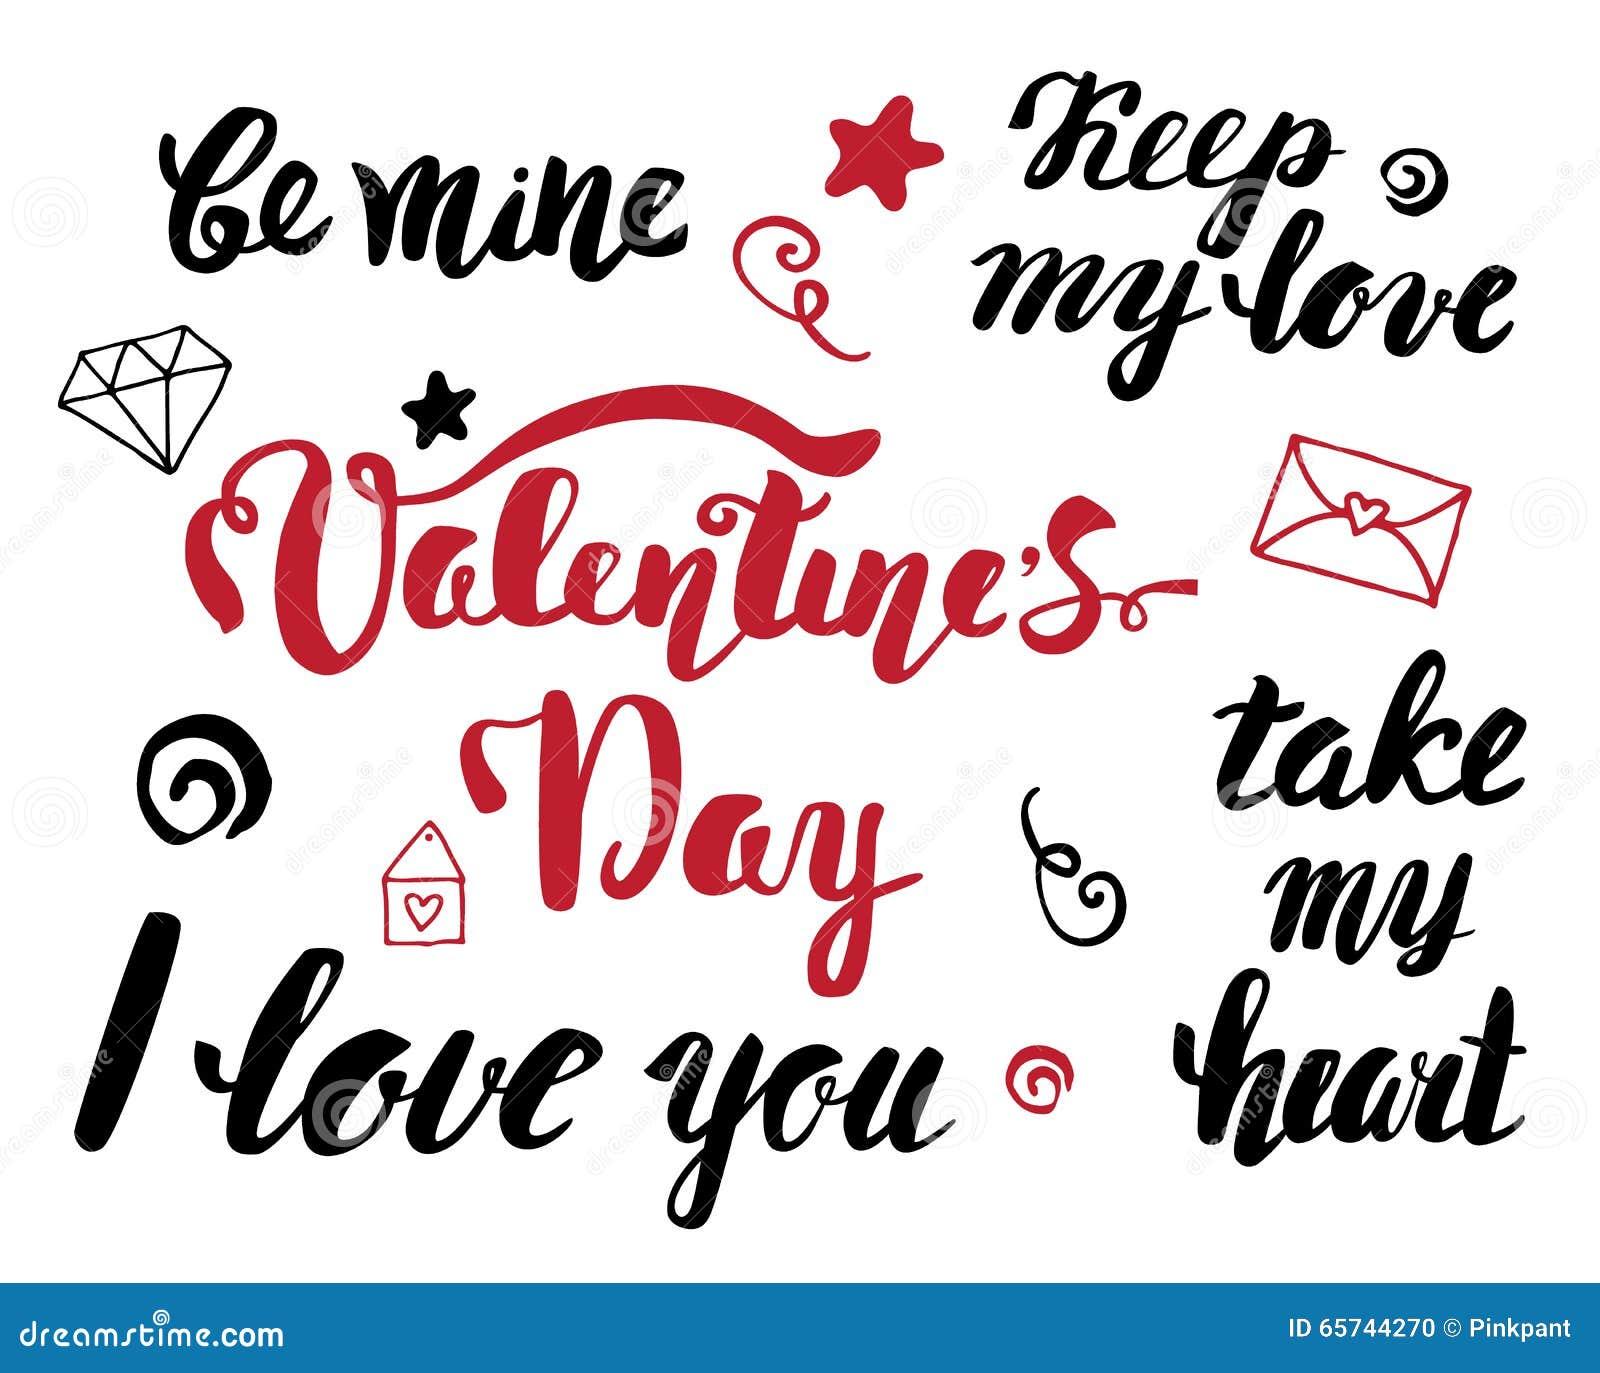 Valentine's Day Phrases Stock Vector - Image: 65806407